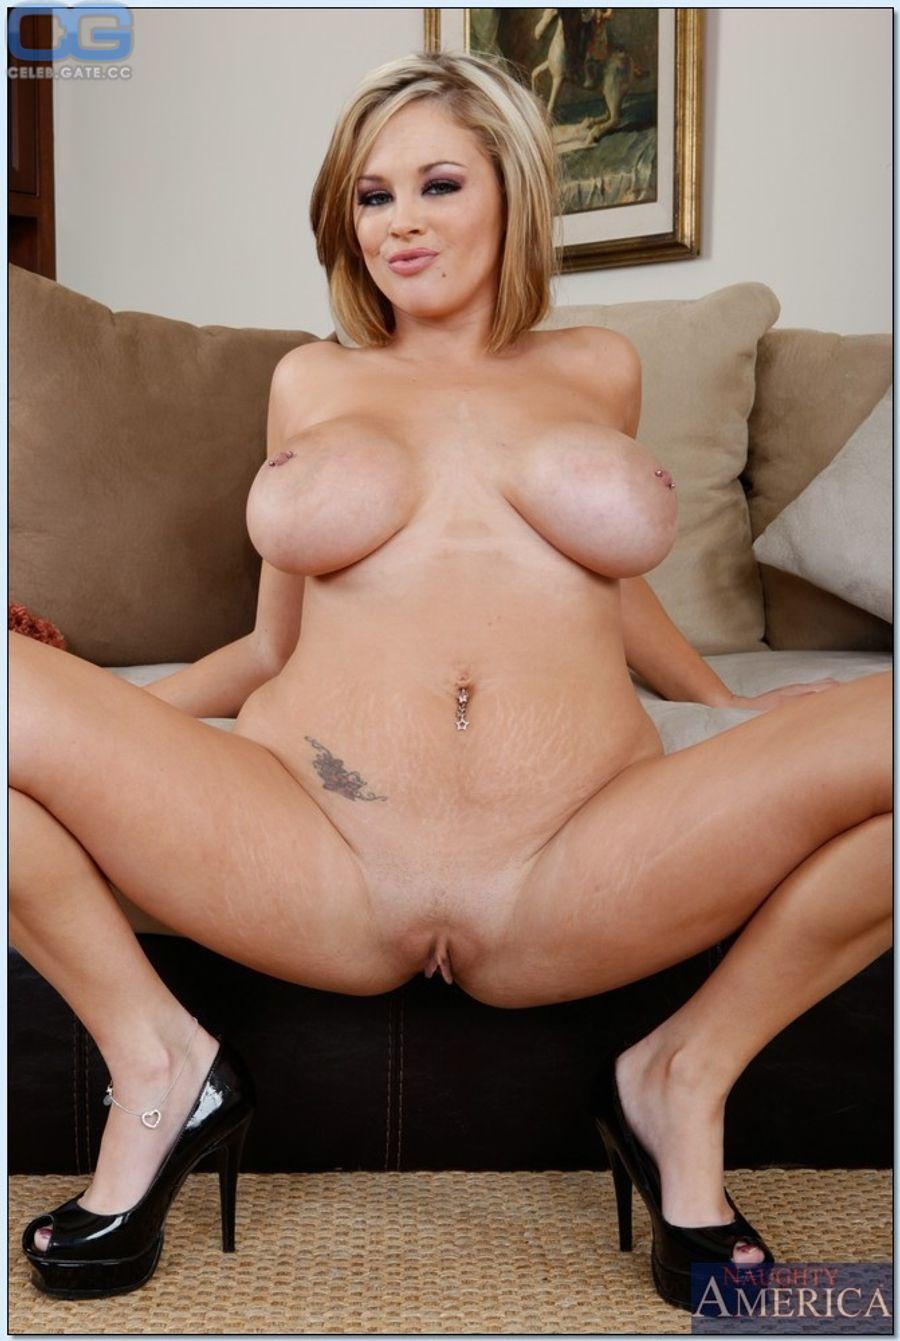 Kate Jennings Grant Nude